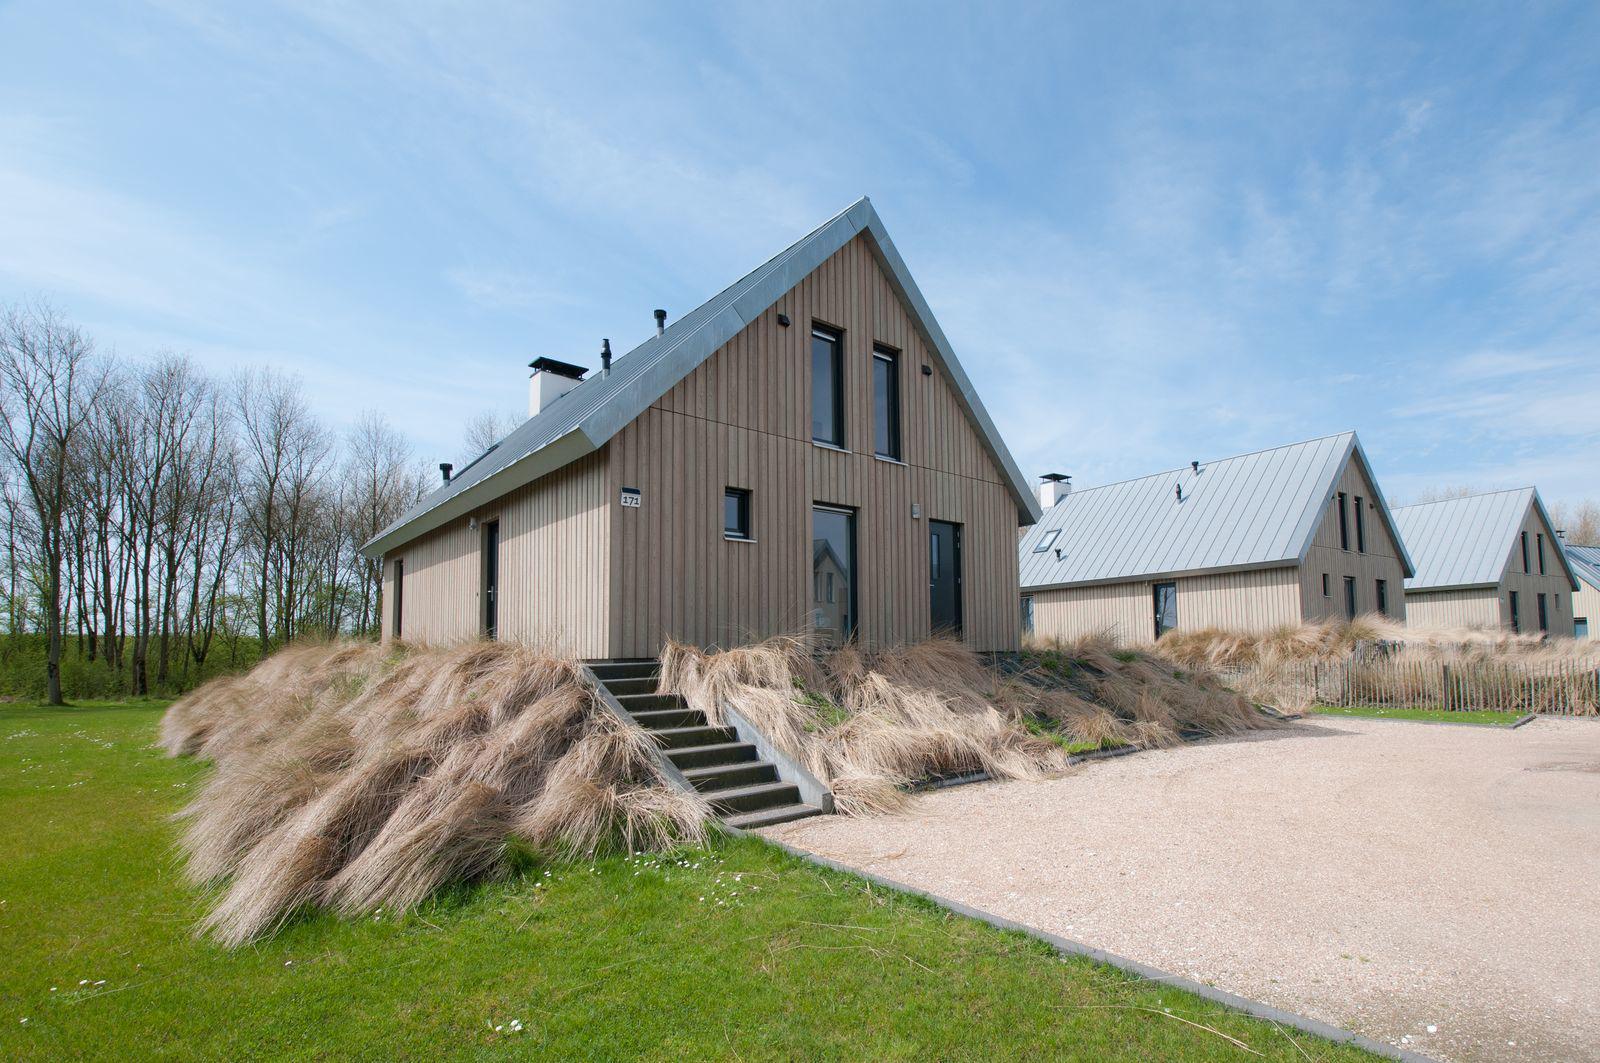 Waterrijk Oesterdam Villa 12 personen Tholen Zeeland